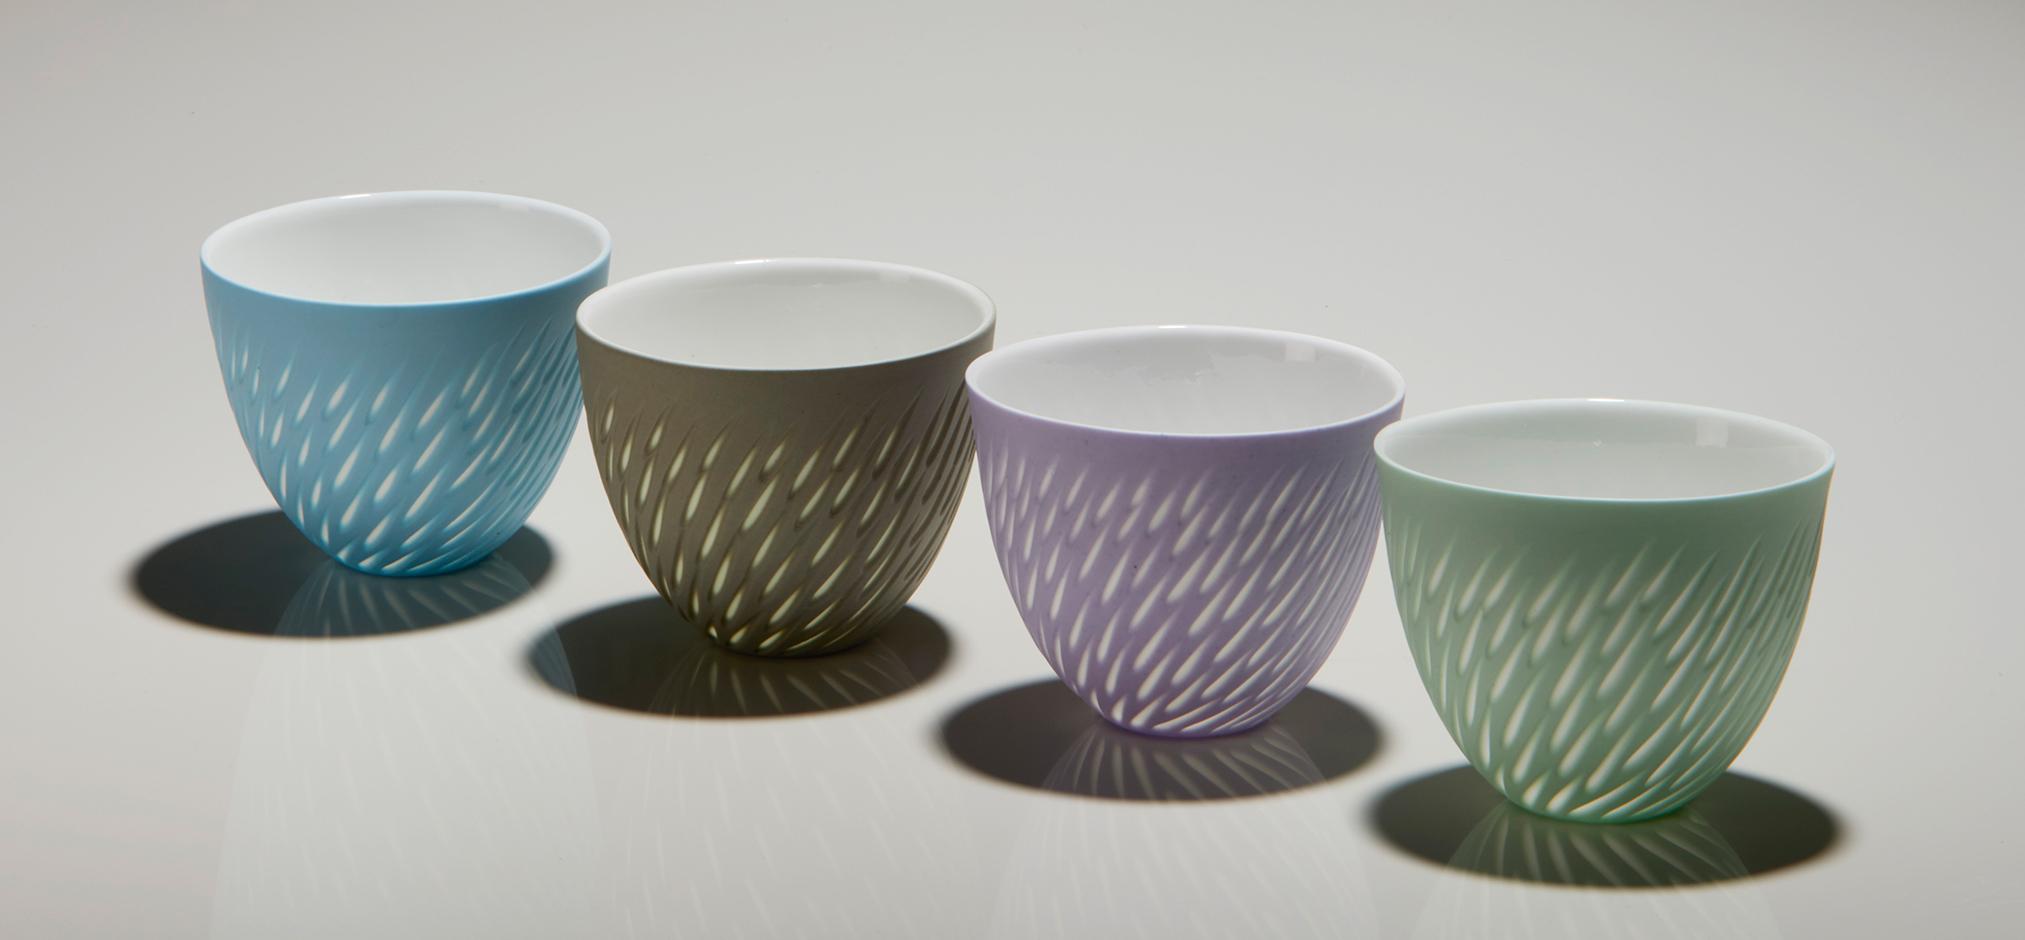 Azure Blue, Sepia Taupe, Soft Lavender, Mint Green - 6 cm h